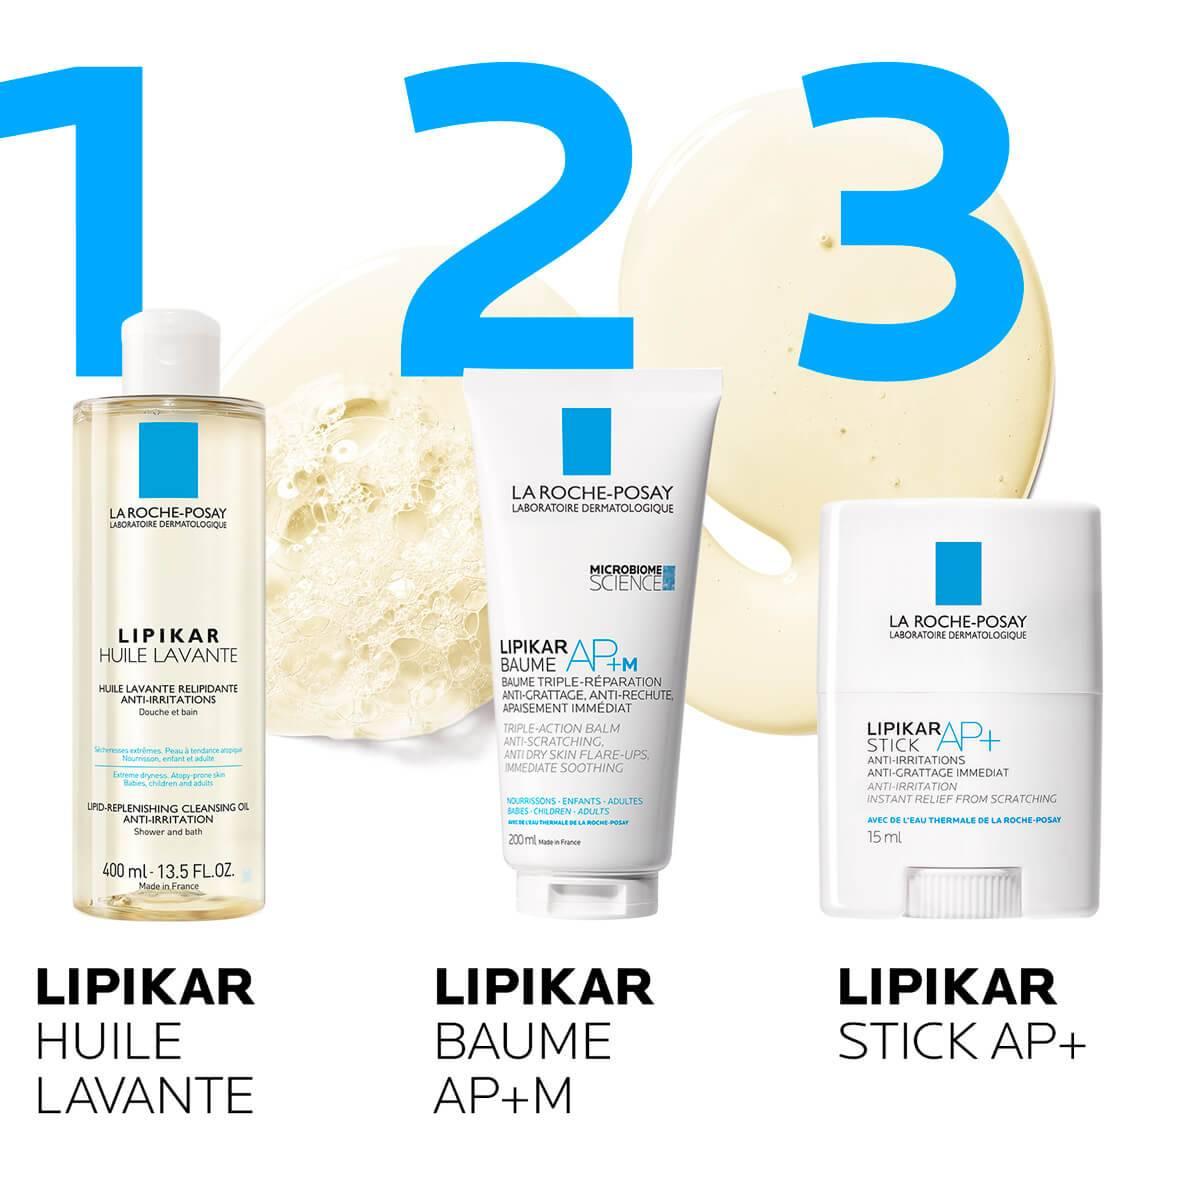 LaRochePosay-Product-Eczema-Lipikar-HuileLavante-400ml-3337872413049-Routine